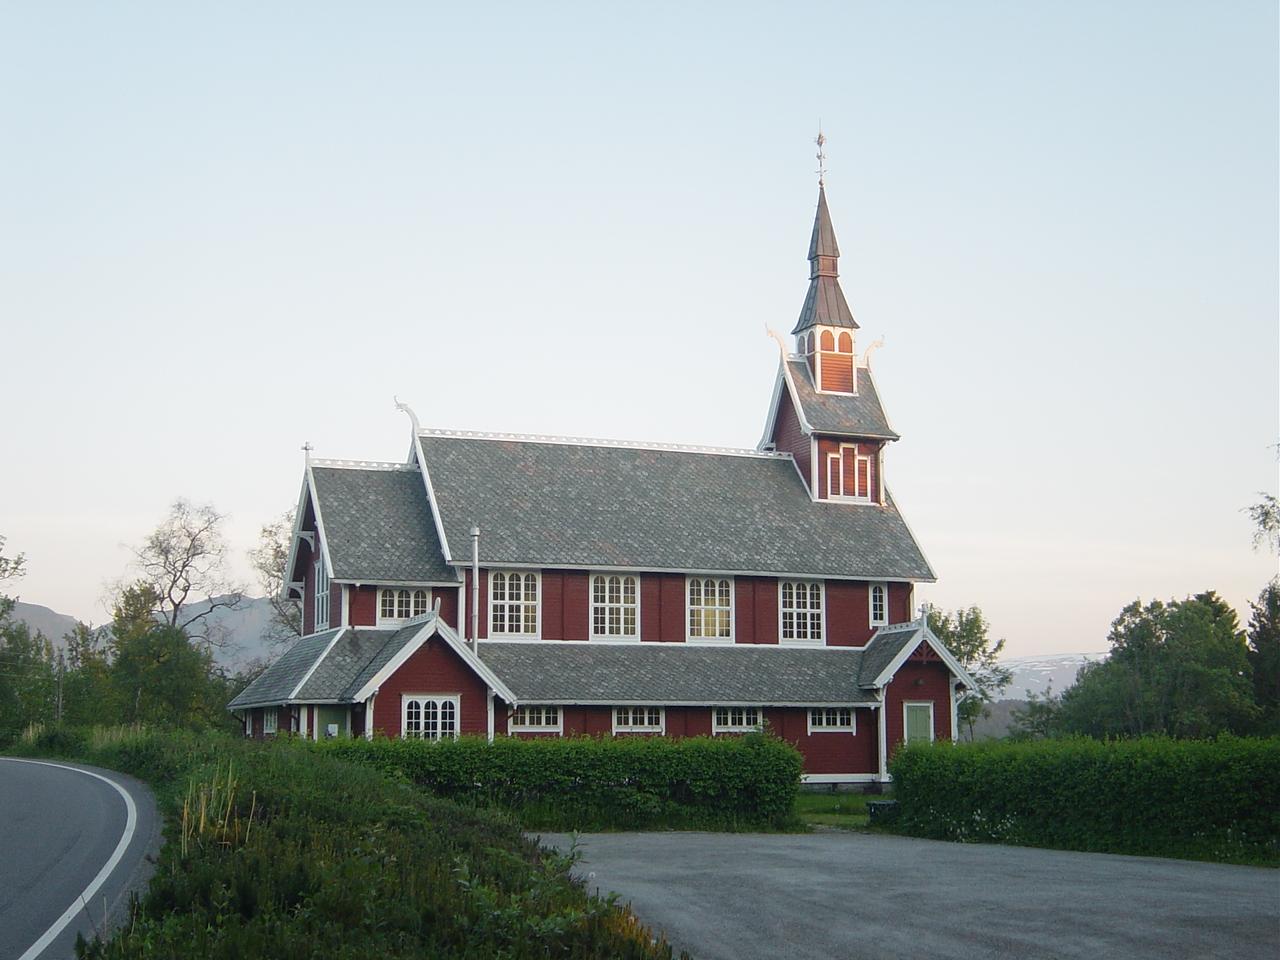 File:Veoy-Molde-kirke-05-2007.JPG